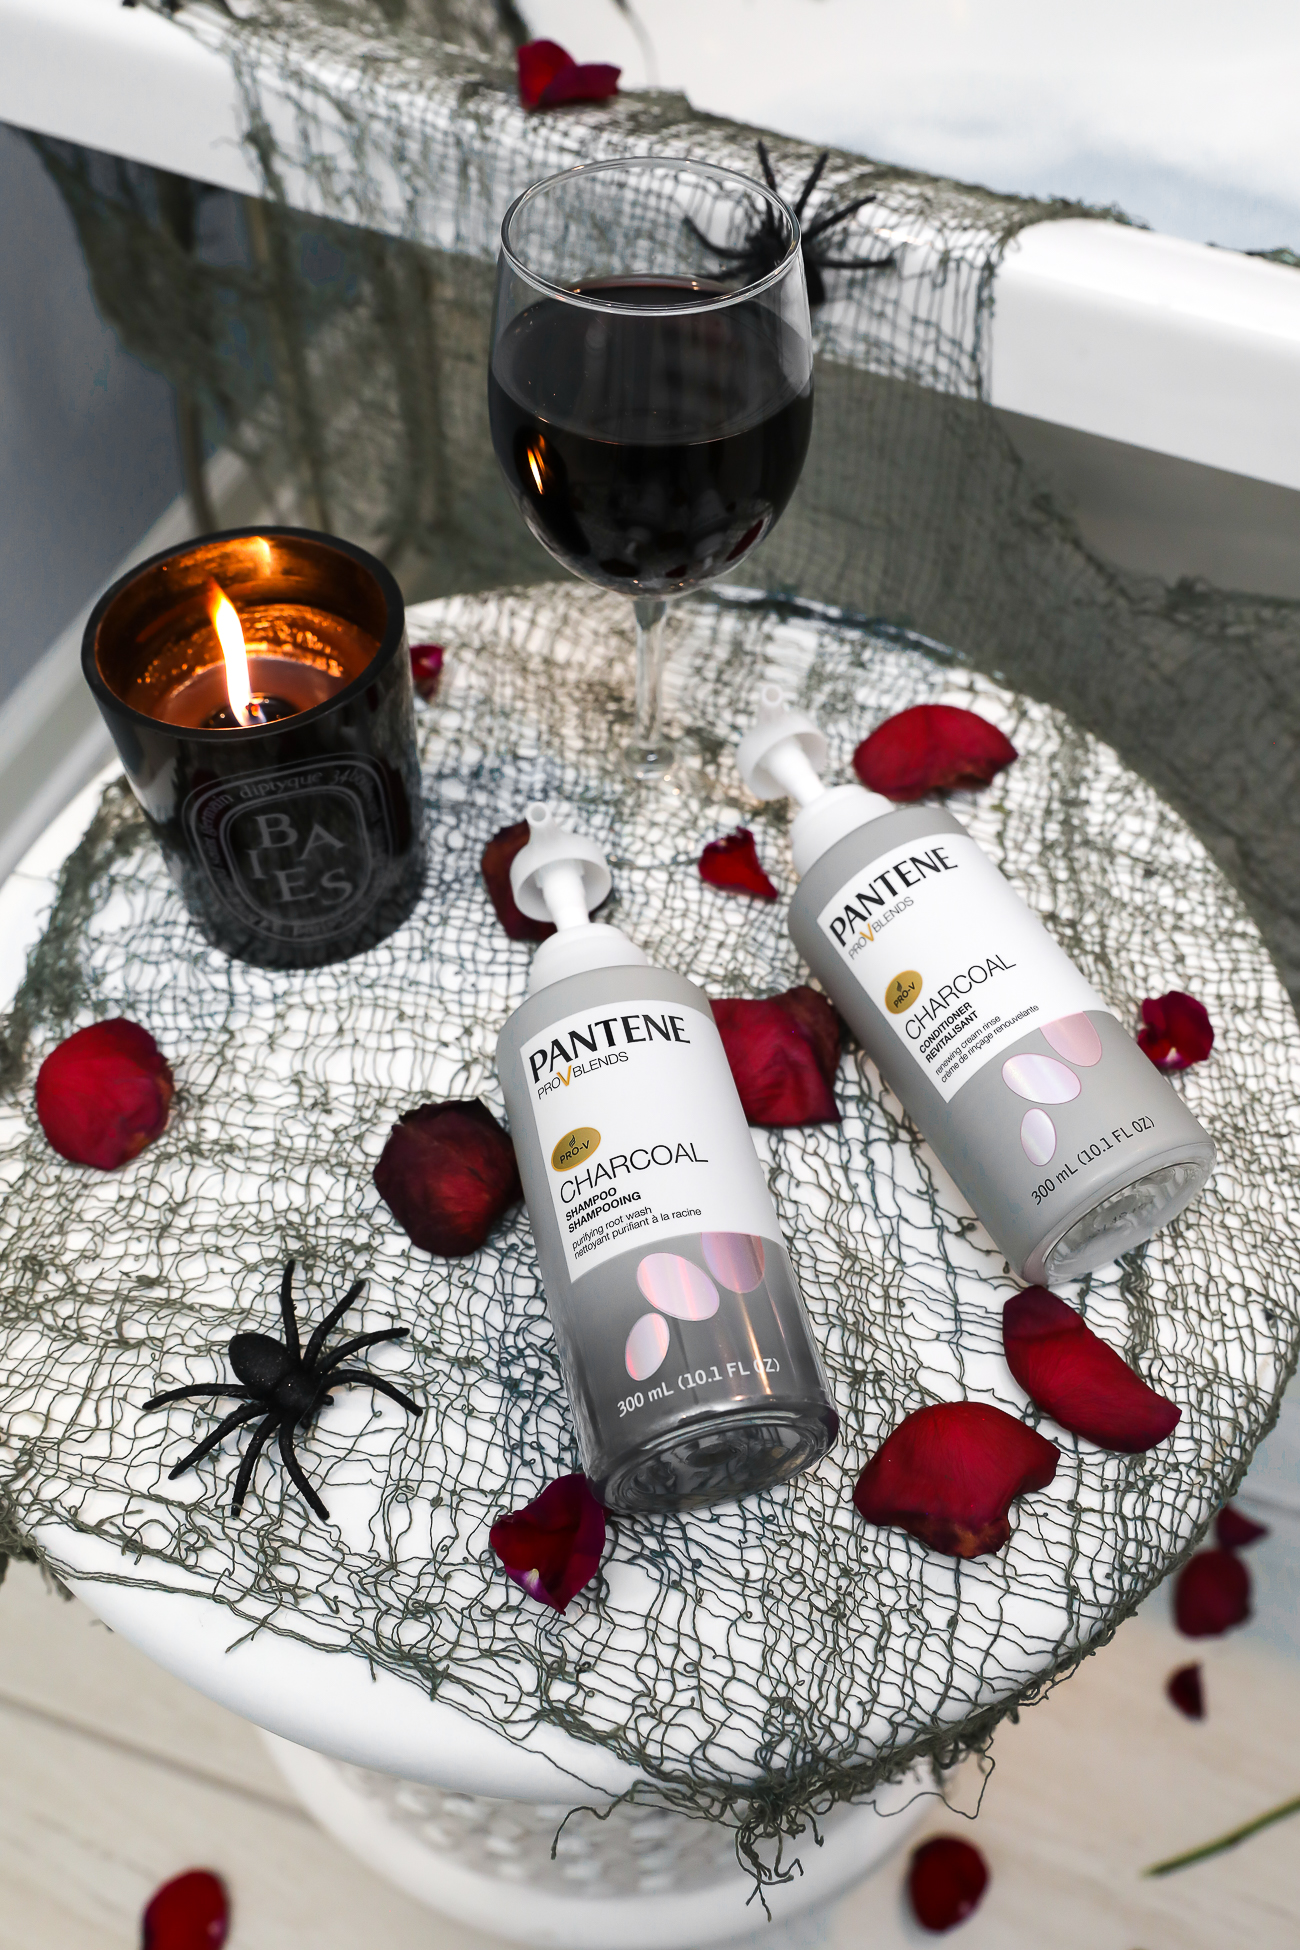 Pantene Charcoal Shampoo & Conditioner Bathtub Picture